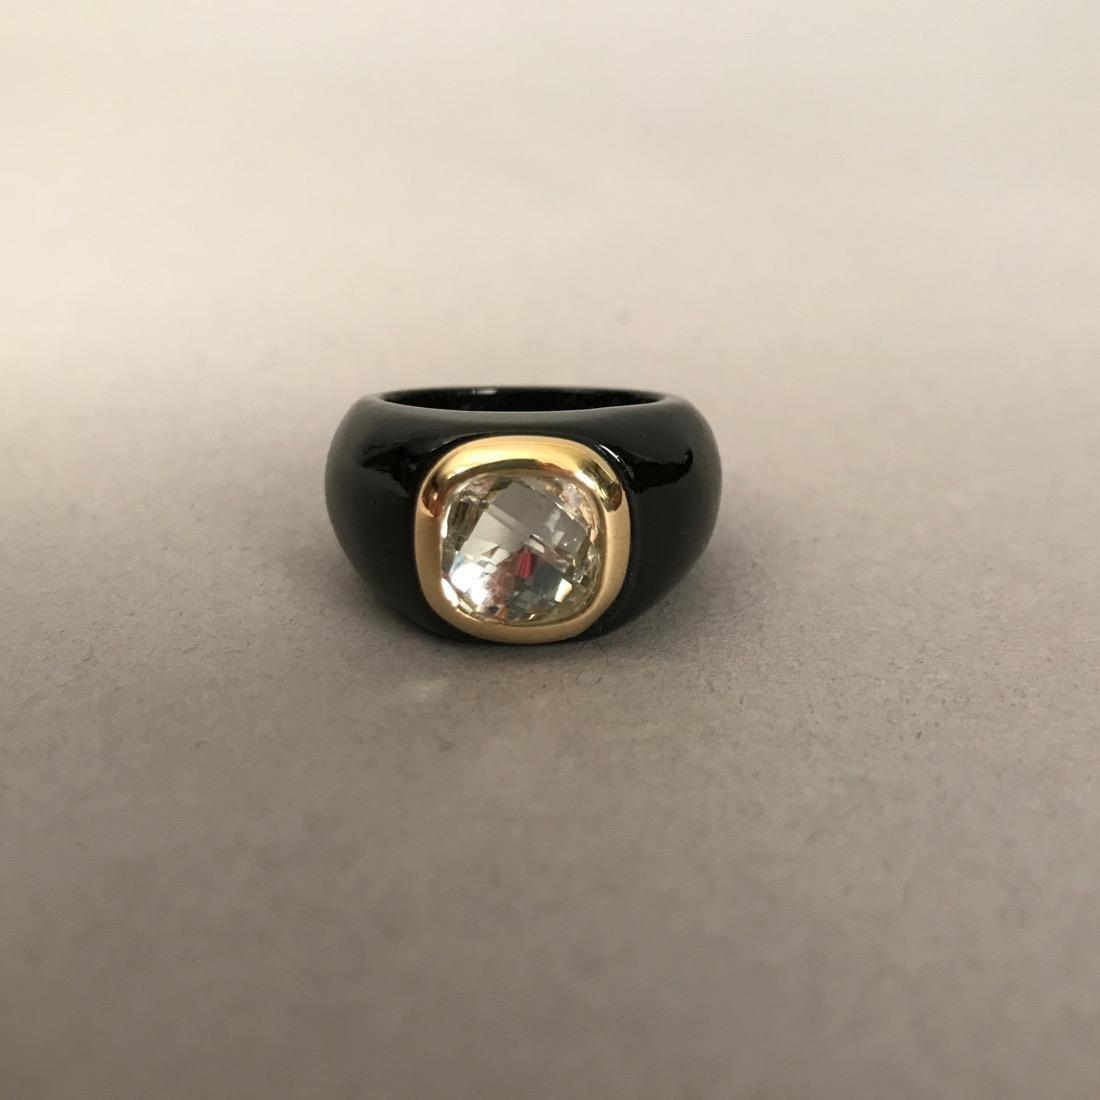 Carved Onyx Ring w Prasiolite in 14K Gold Bezel